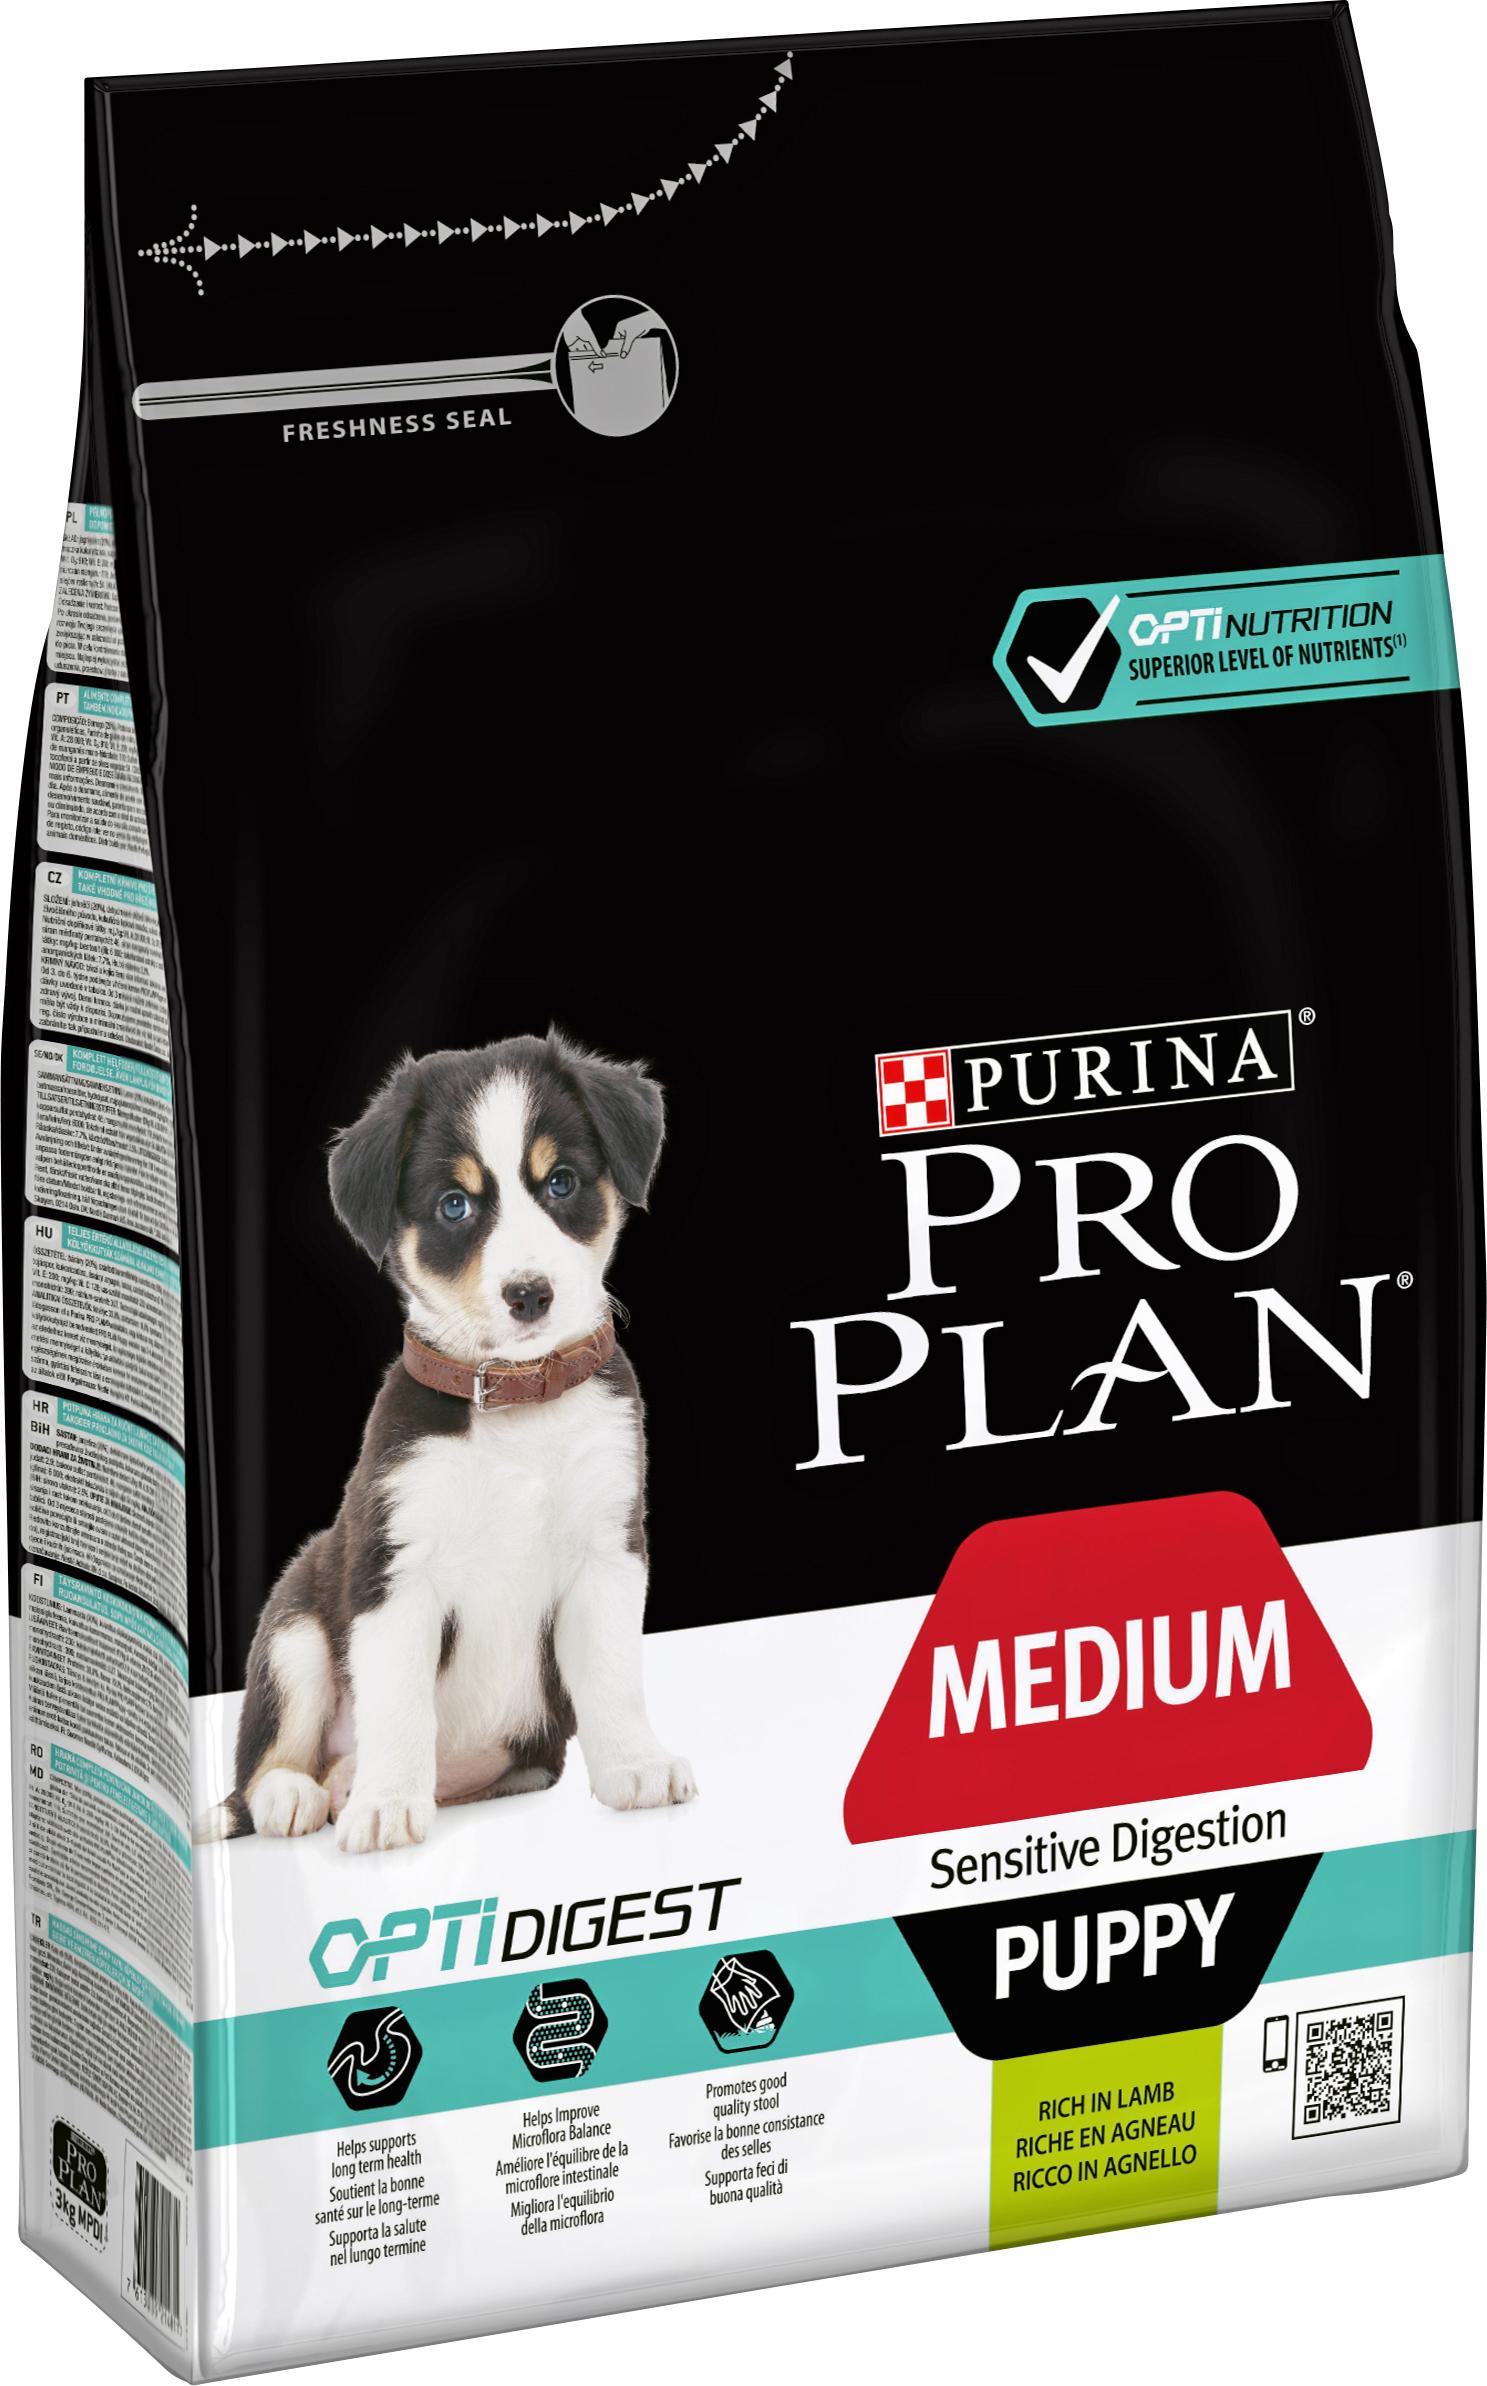 Hundfoder Pro Plan Medium Puppy Sensitive Digestion, 3 kg